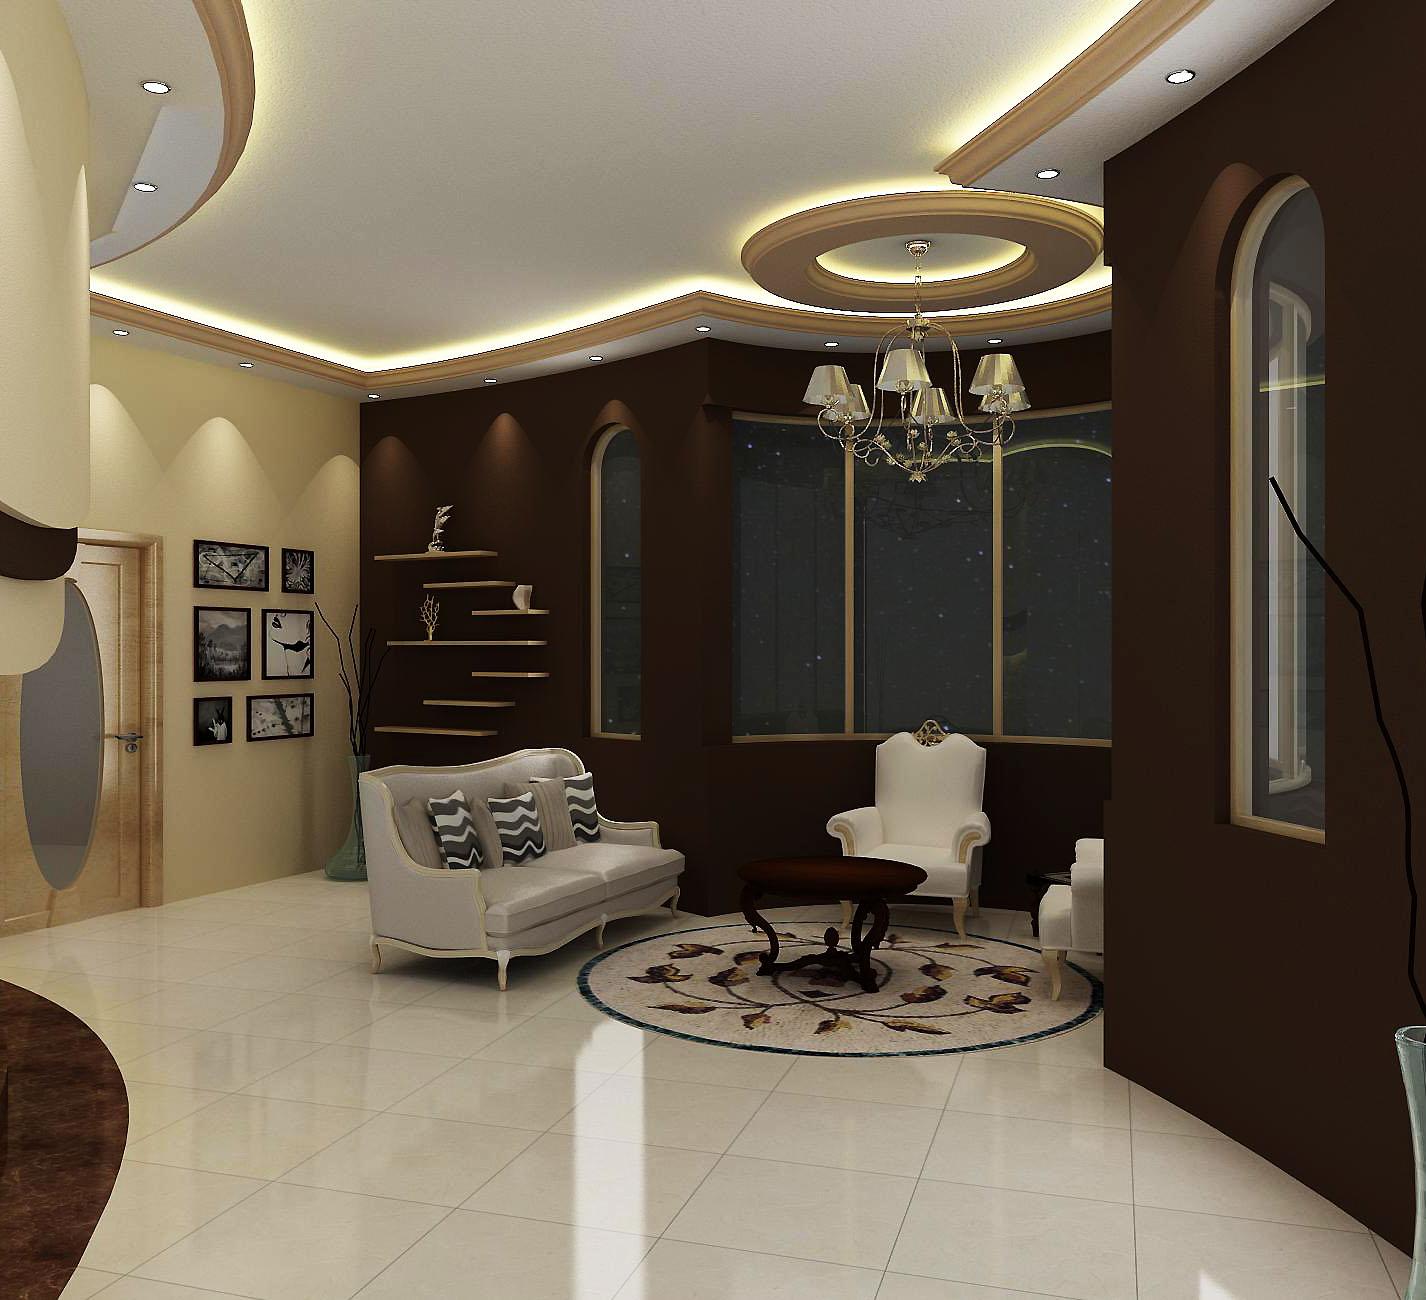 Wasim riaz interior design for a arabic mujlis for Interior decoration vs interior design